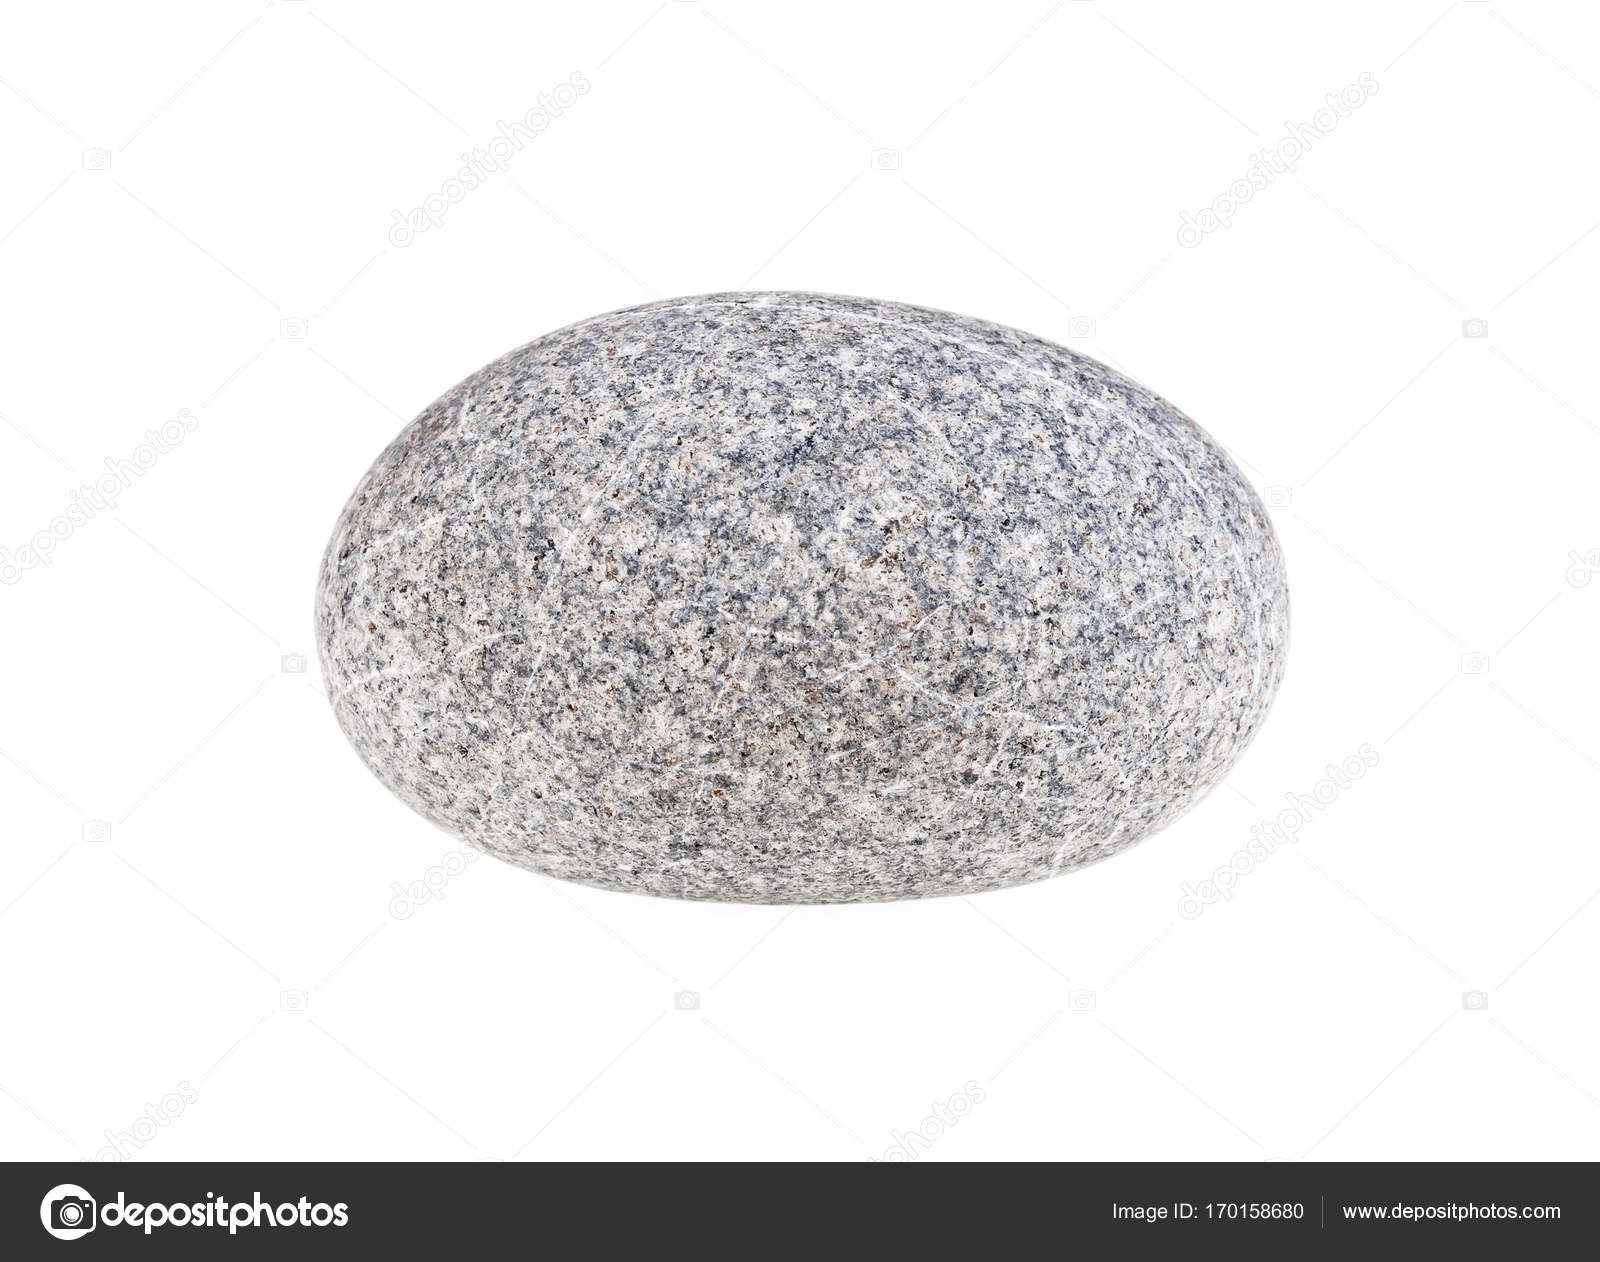 Pebble Stone Isolated On A White Background Stock Photo